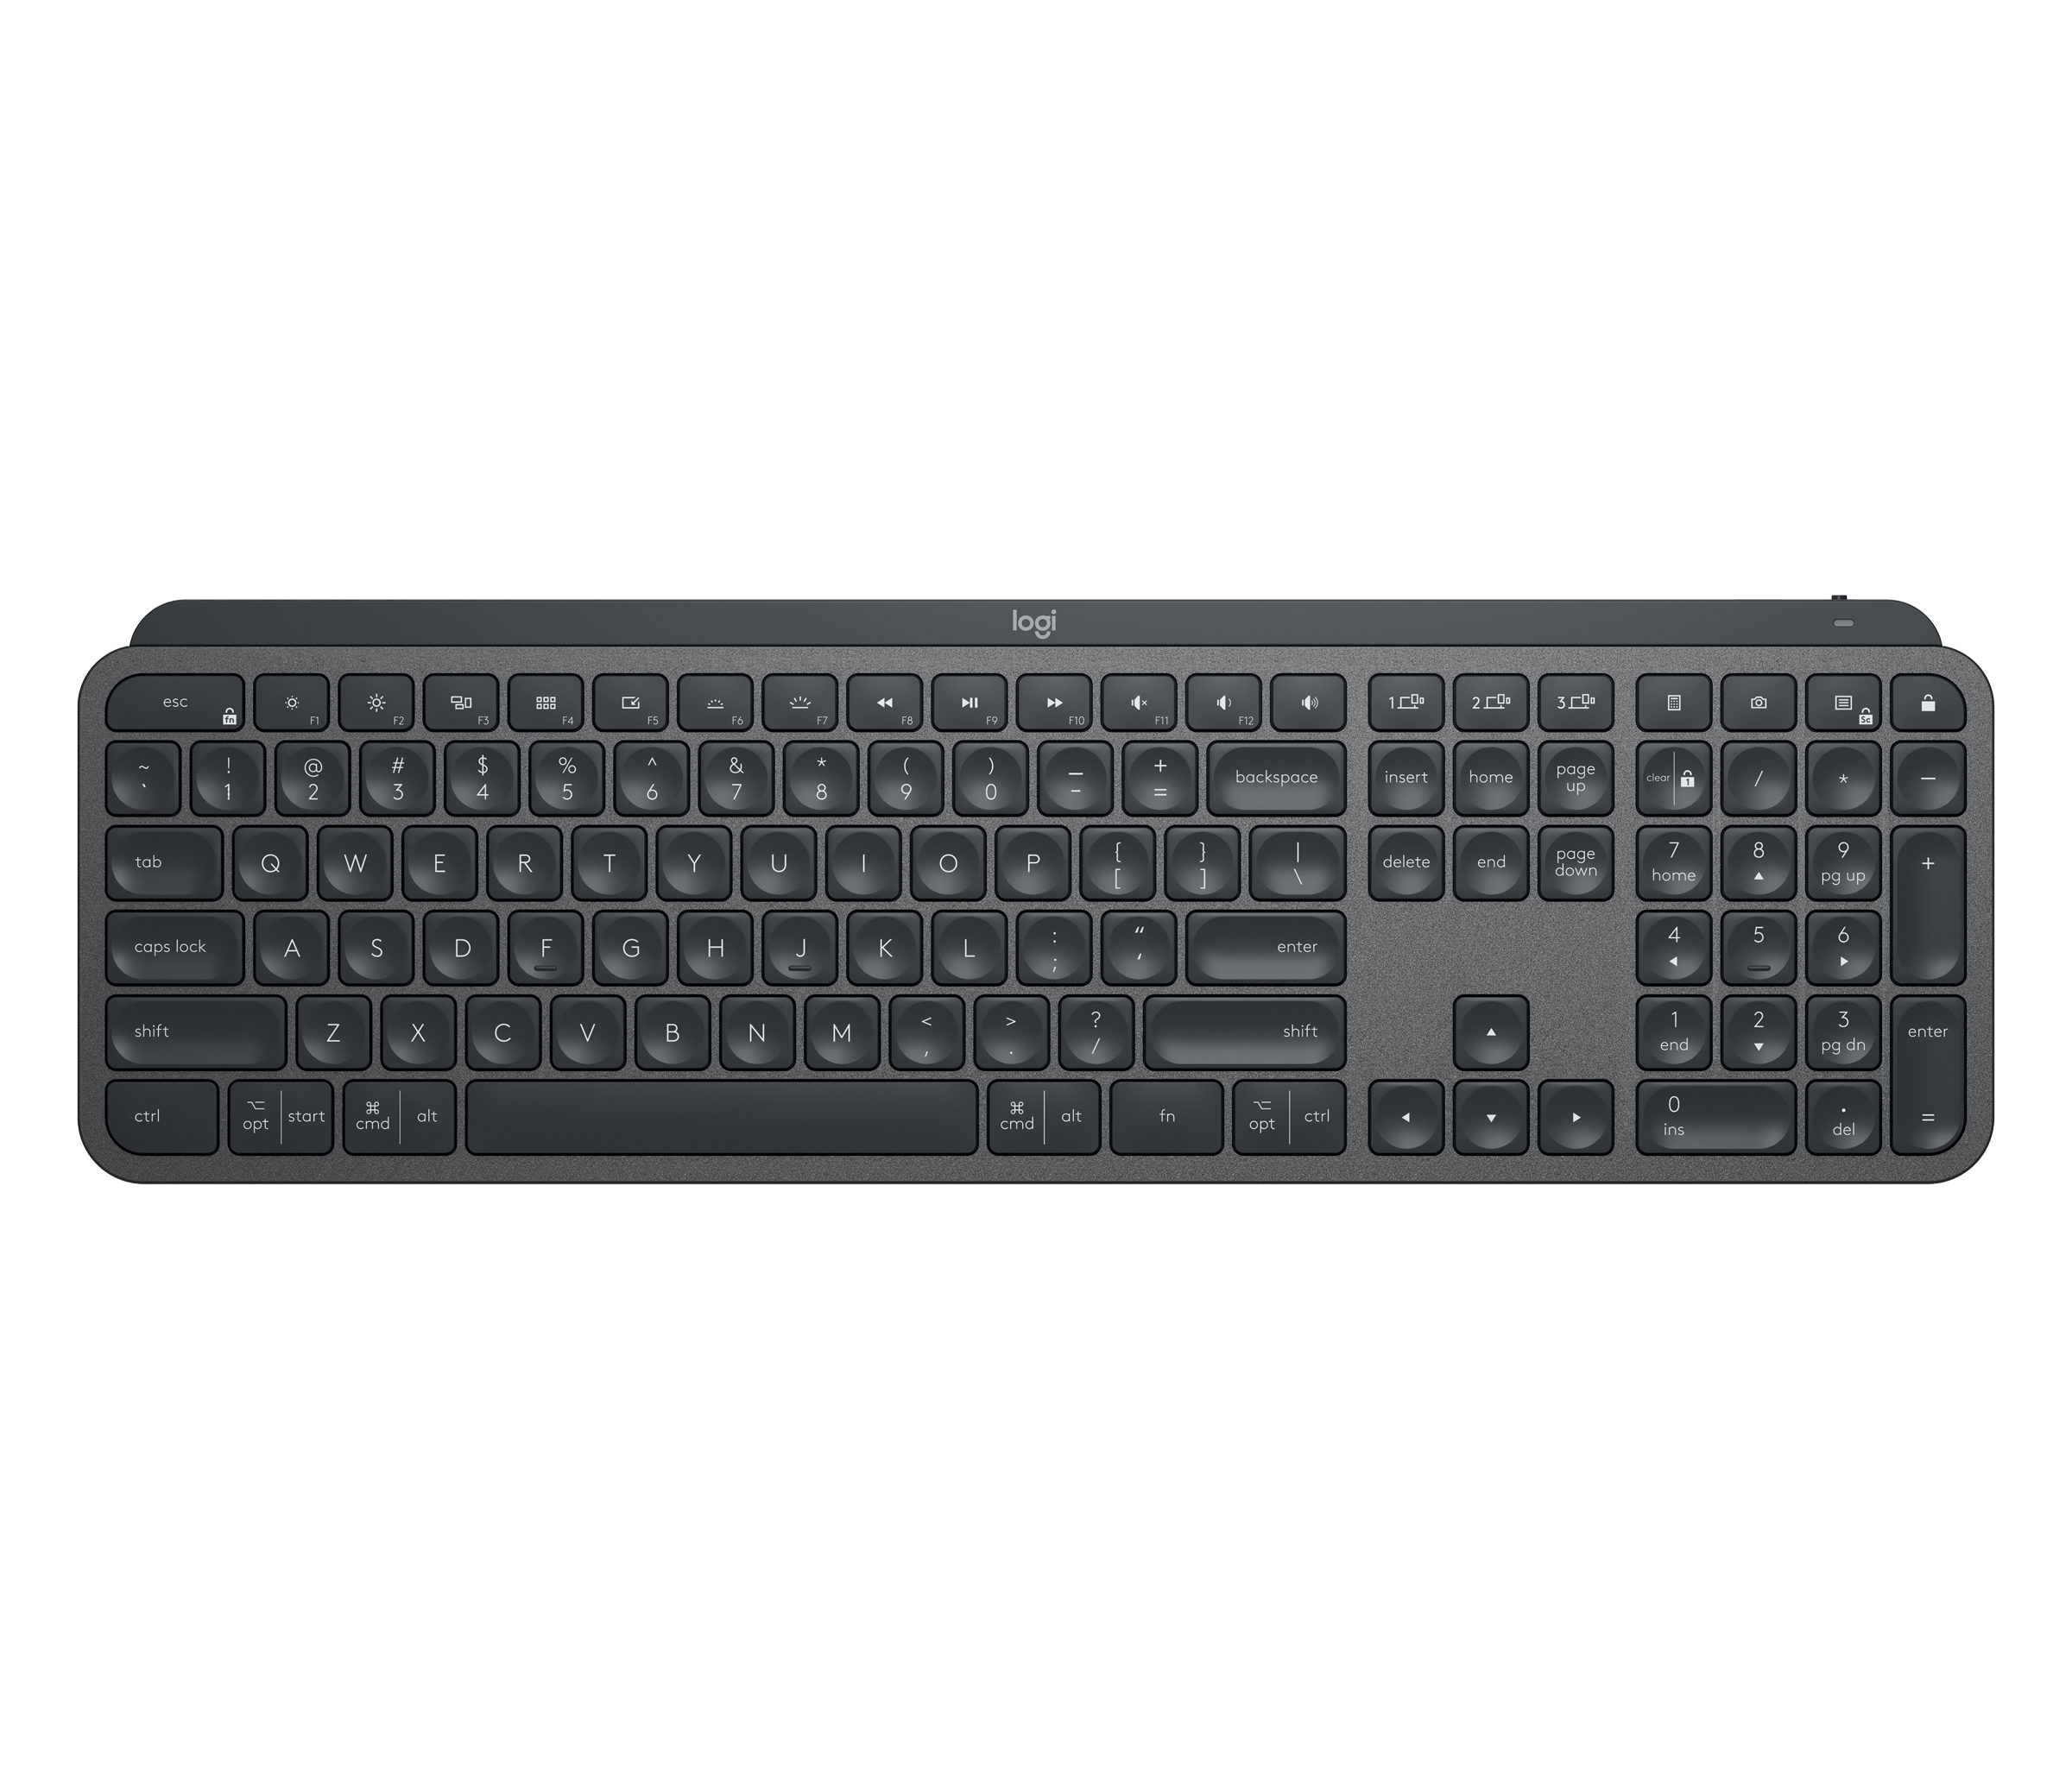 Mx Keys Wireless Illuminated Keyboard